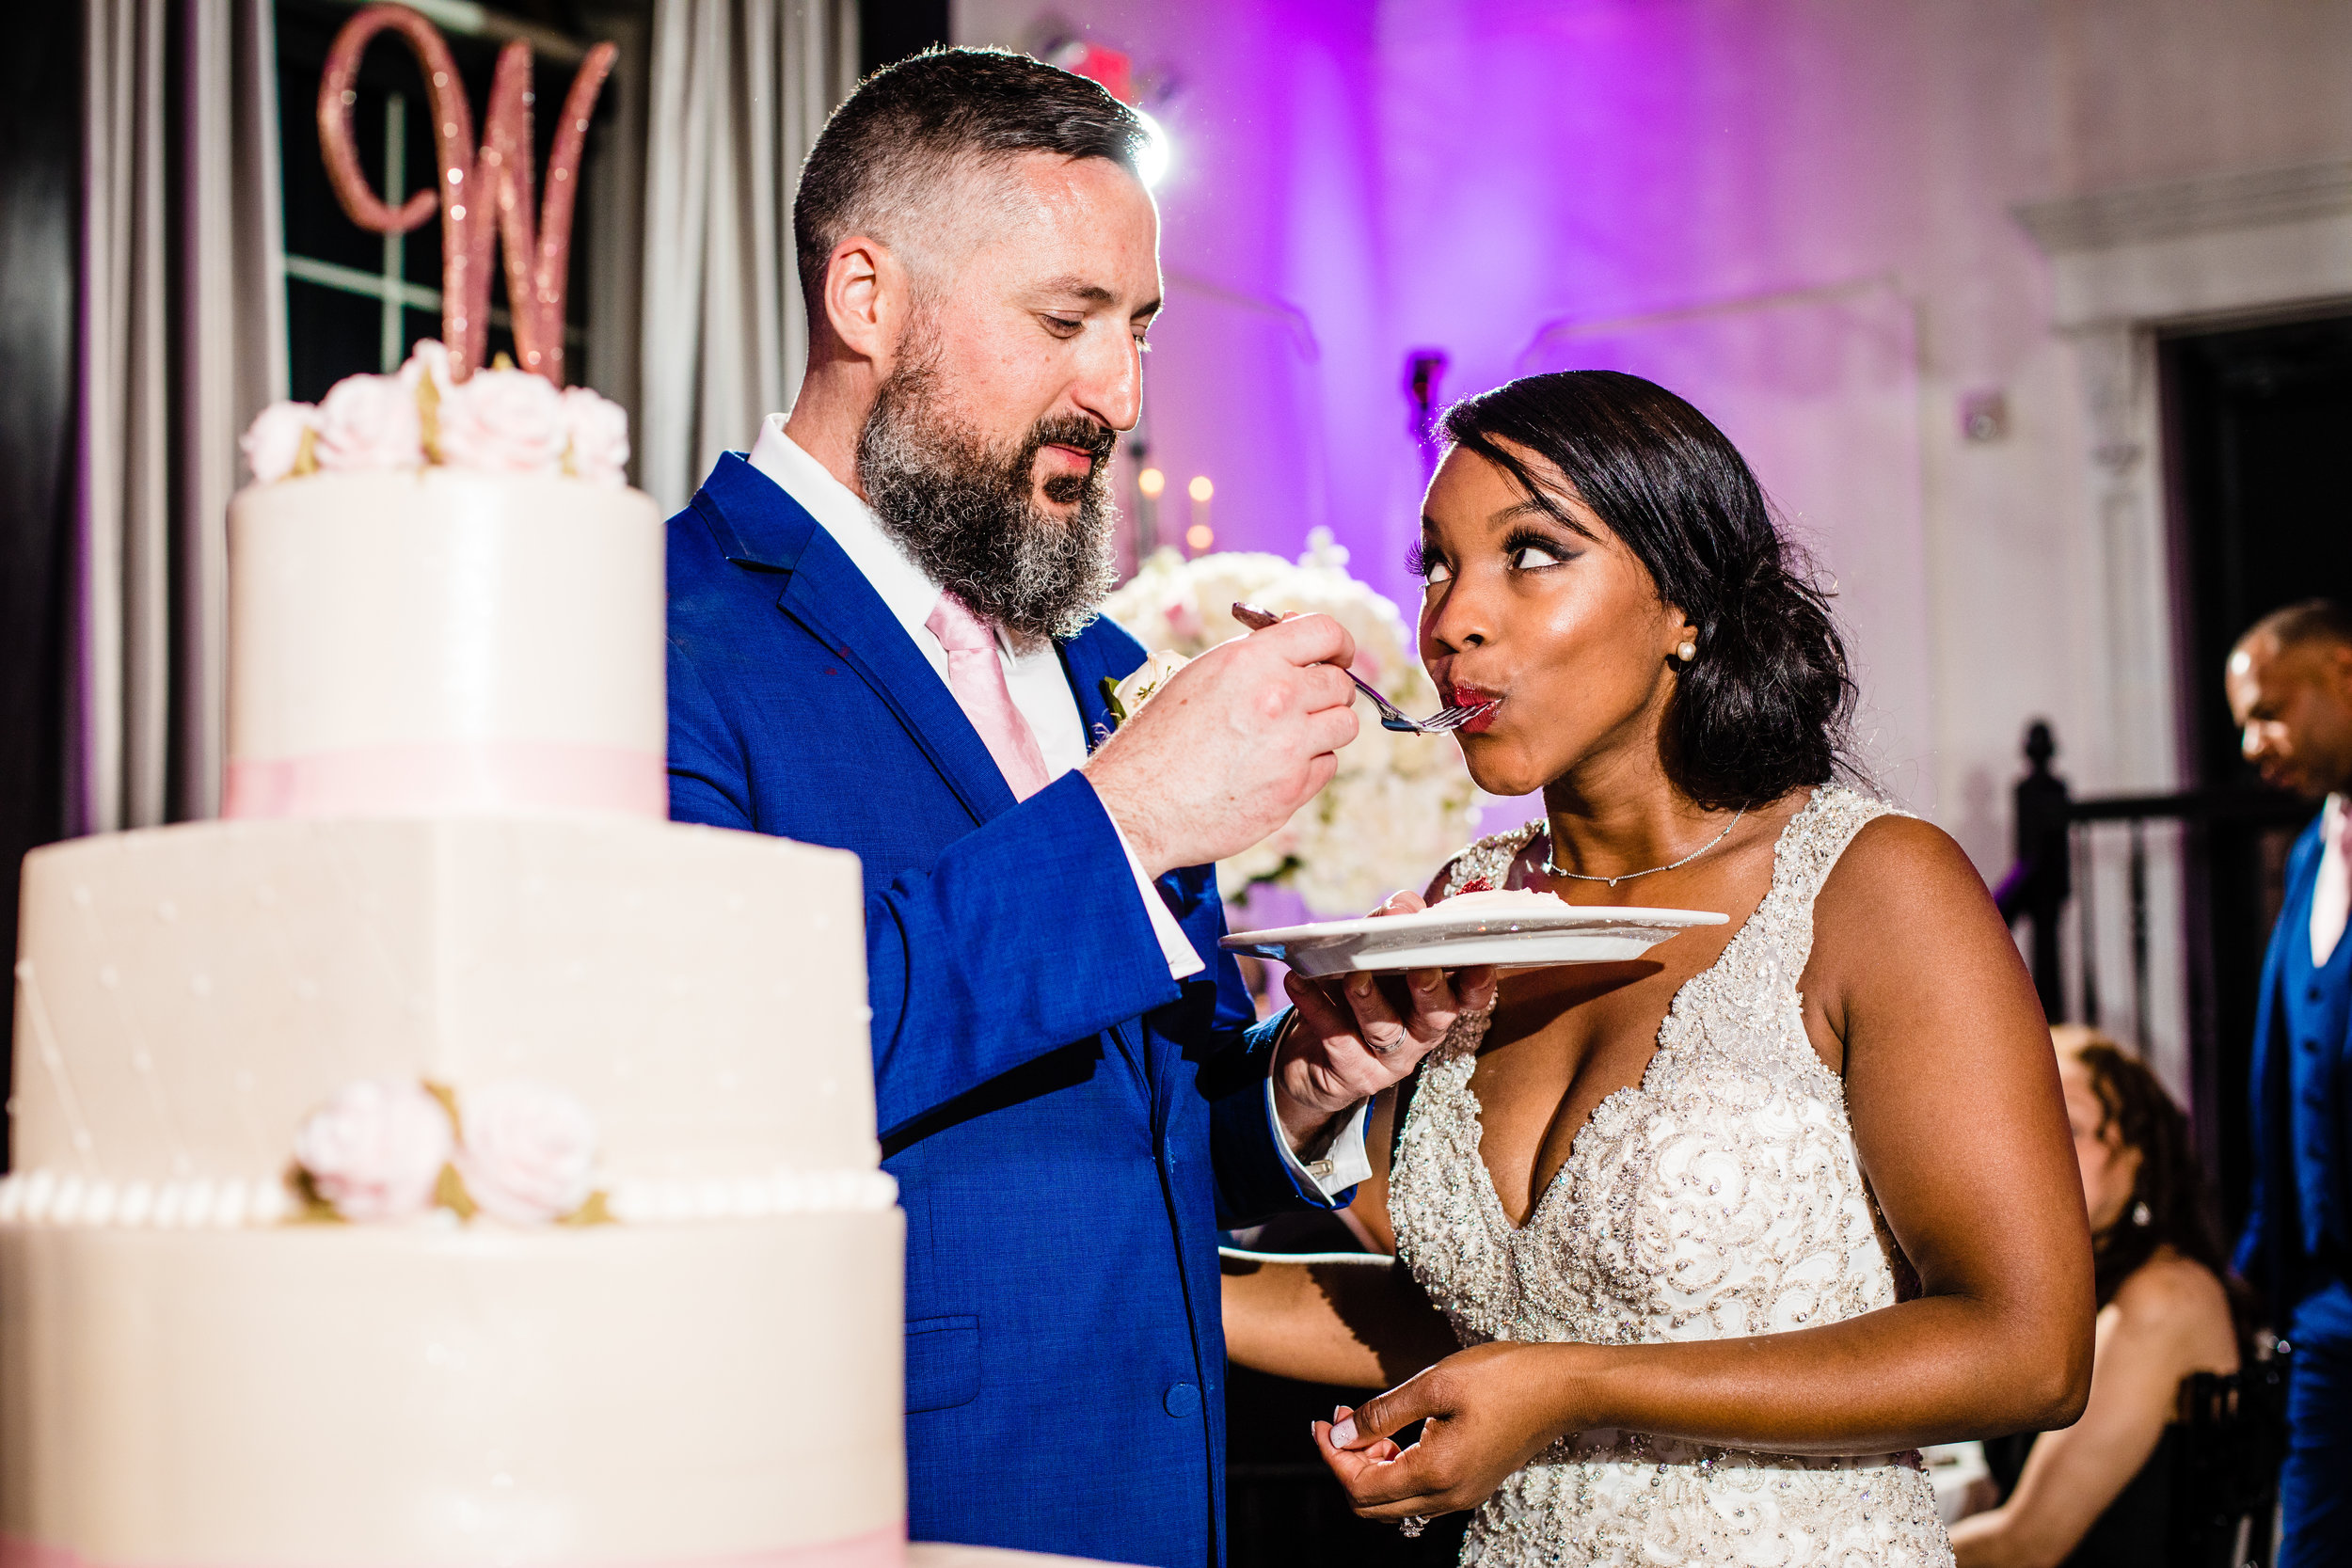 groom feeding the bride her cake